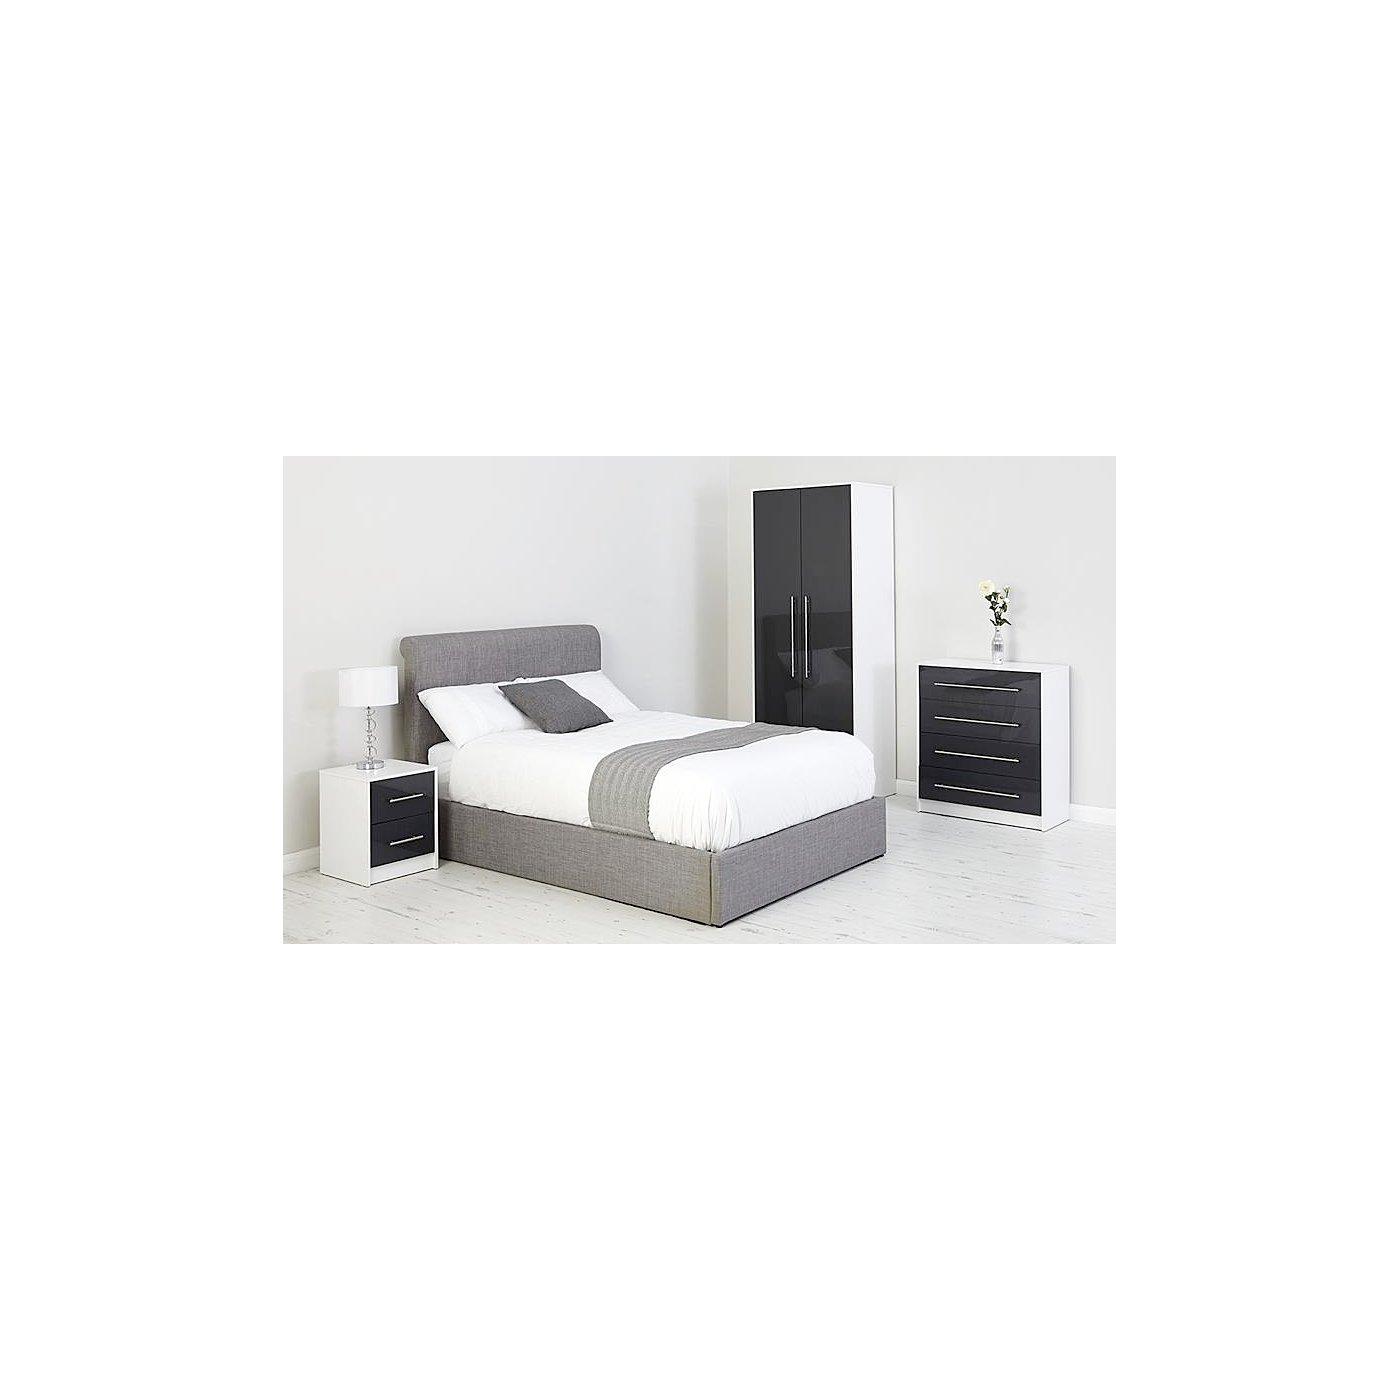 White Bedroom Furniture Asda Best Ideas 2017. White Bedroom Furniture Sets Asda   Bedroom Design